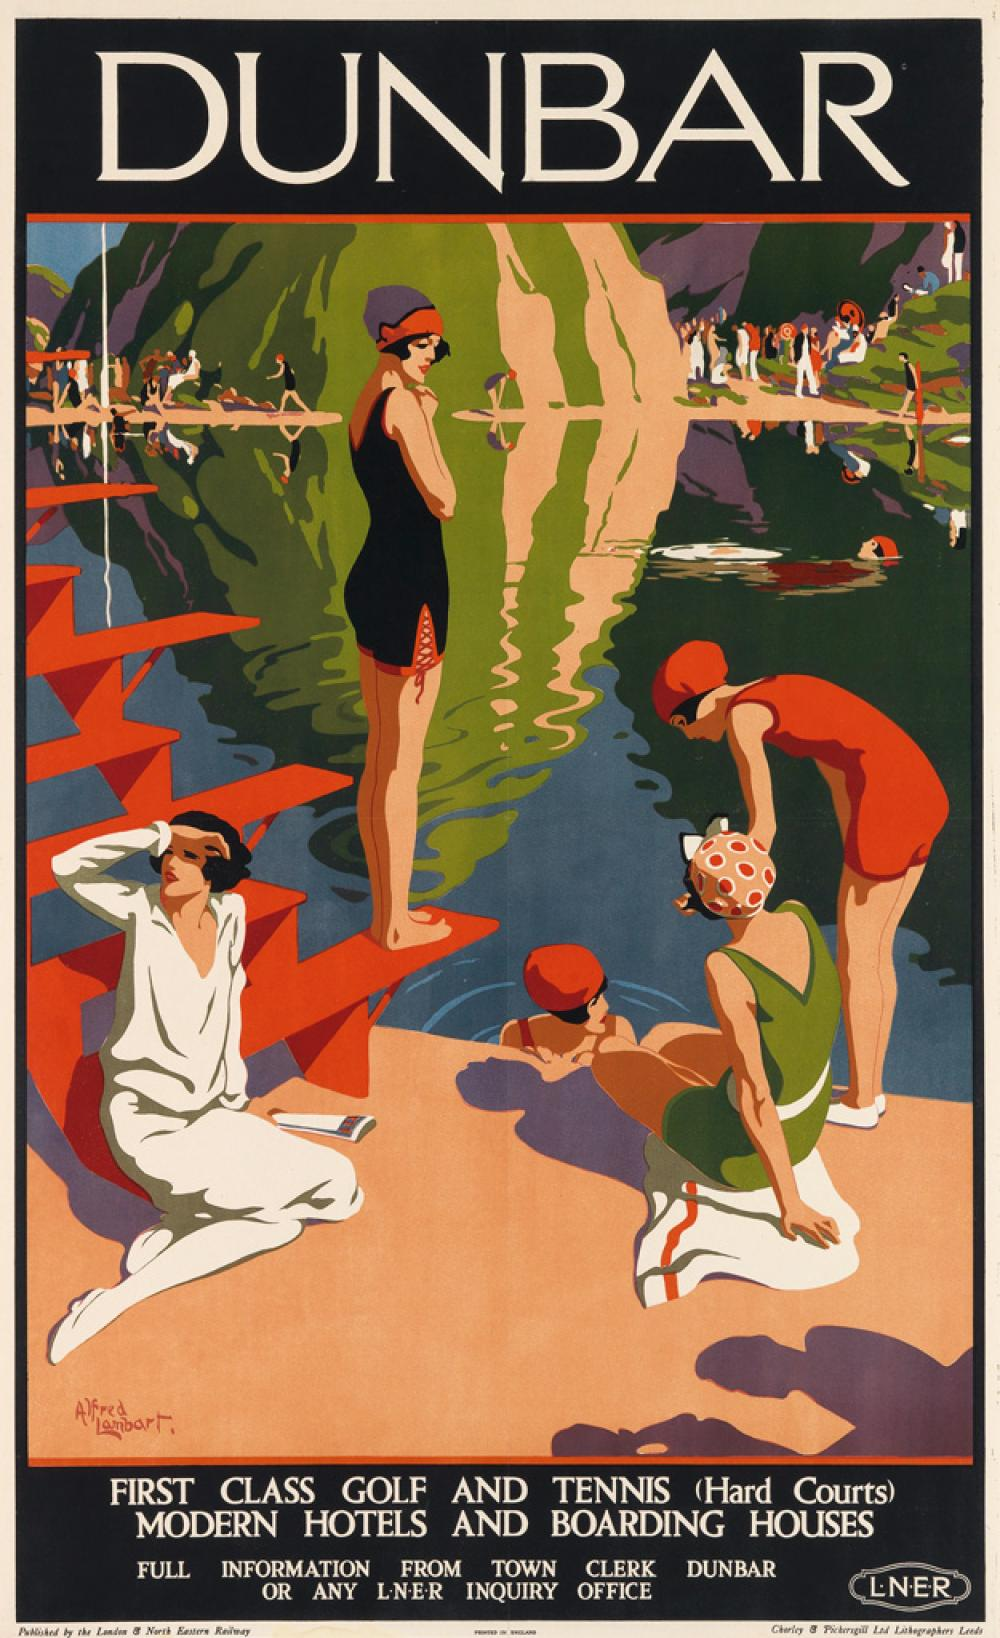 ALFRED LAMBART (1902-1970). DUNBAR. Circa 1925. 40x24 inches, 101x62 cm. Chorley & Pickersgill Ltd., Leeds.